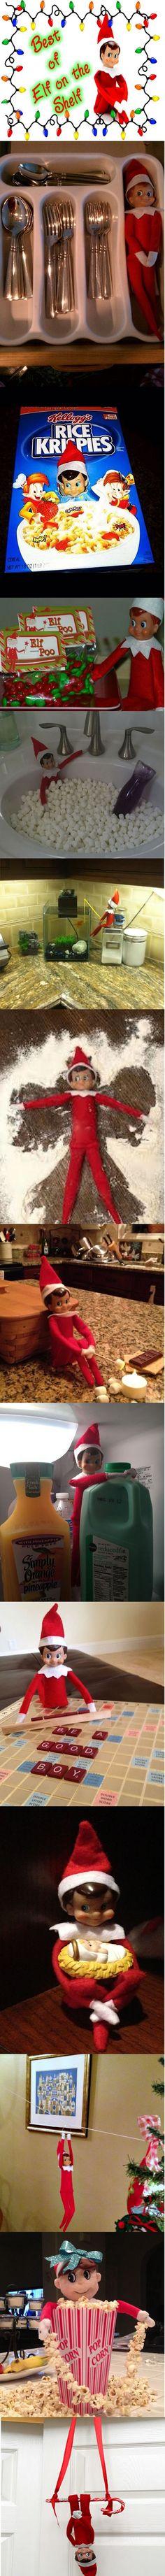 Vitamin-Ha – More Awesome Elf on the Shelf Ideas (35 Pics)